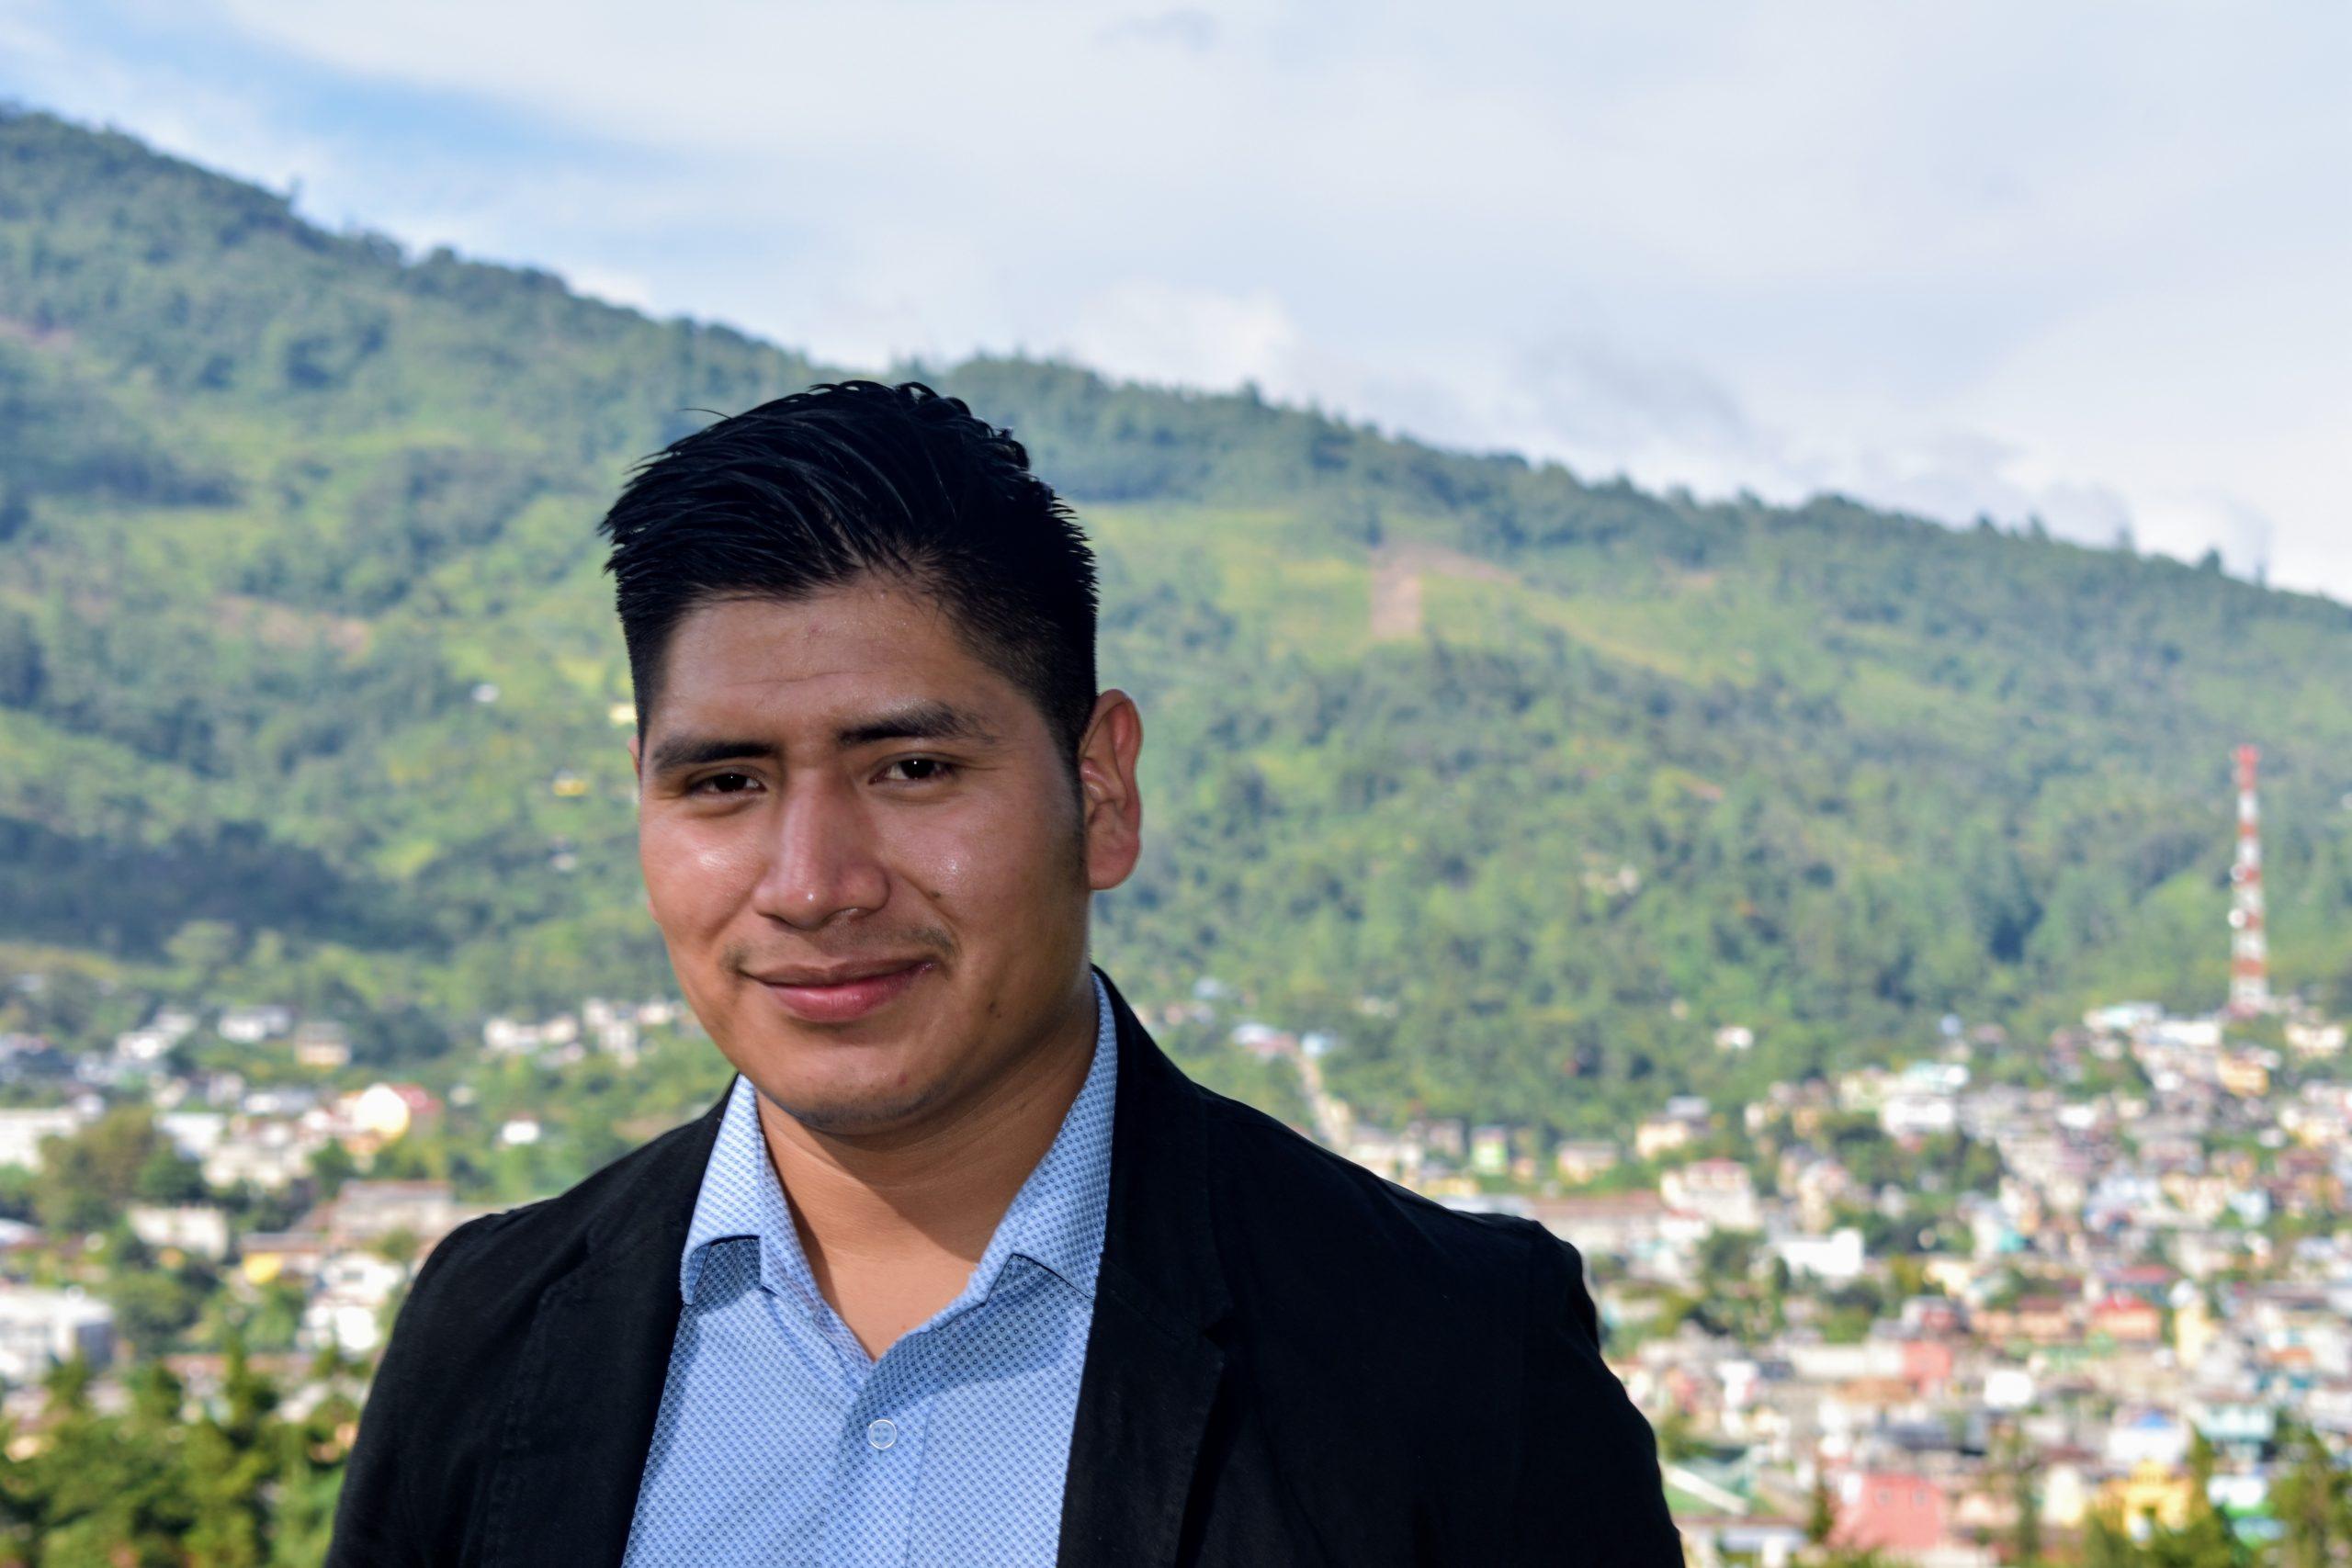 Guatemala periodismo. Francisco Simón de Prensa Comunitaria, Guatemala